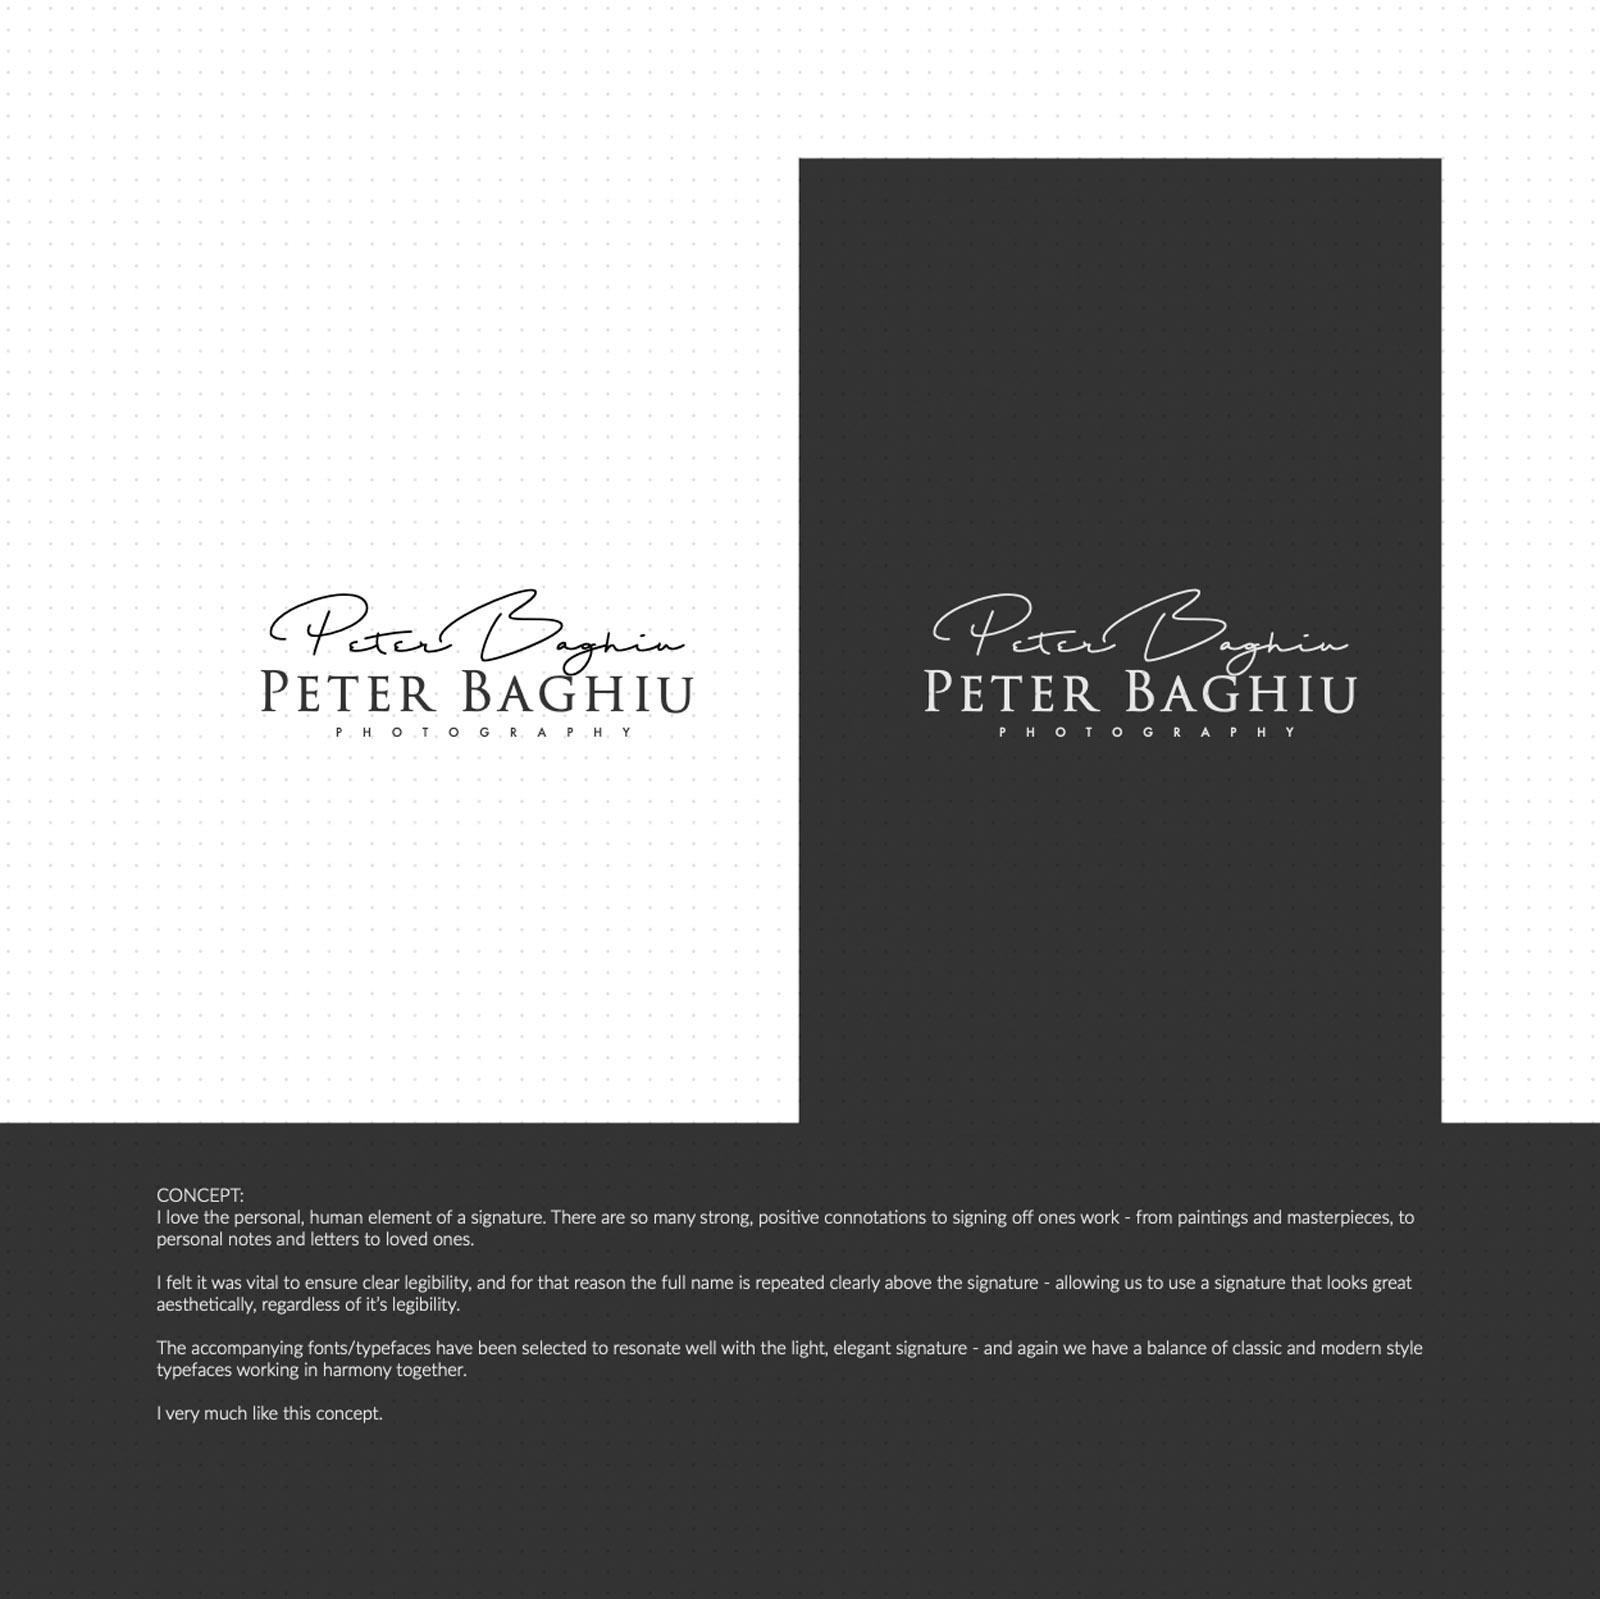 wedding-photographer-logo-design-02